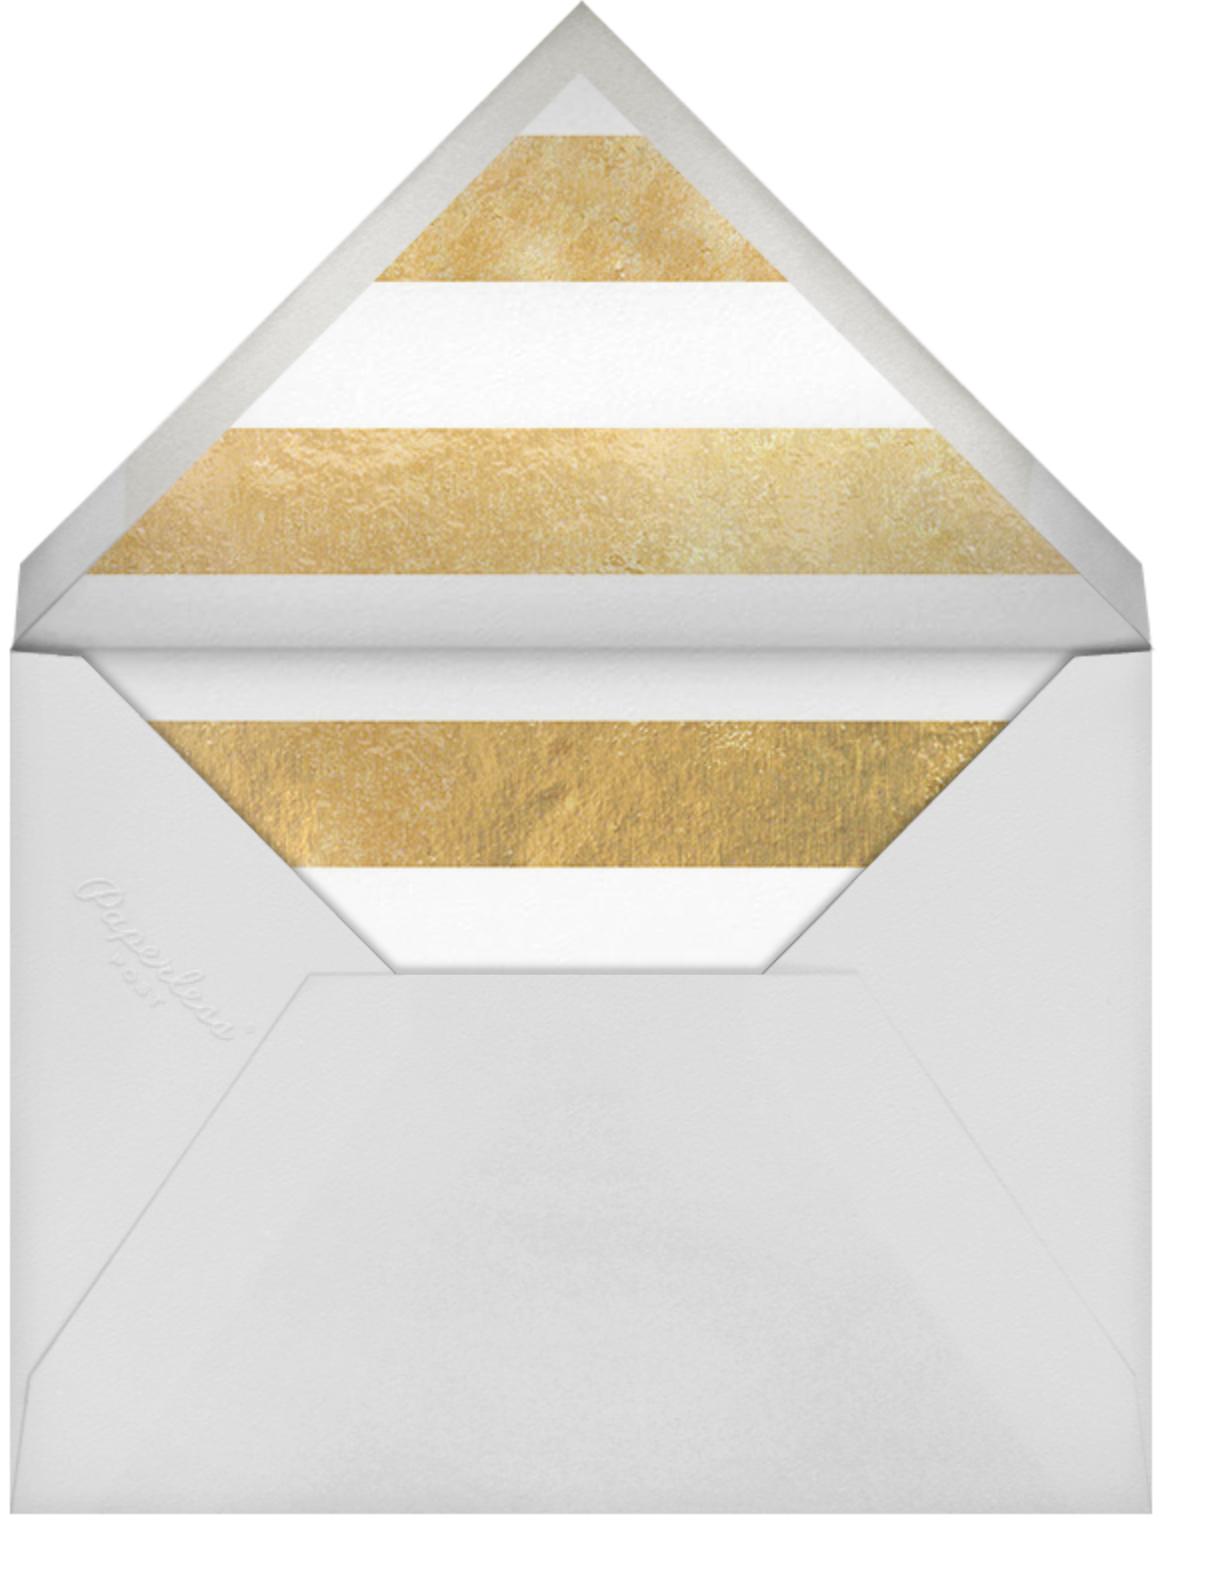 Stripe Suite (Invitation) - Gold - kate spade new york - All - envelope back